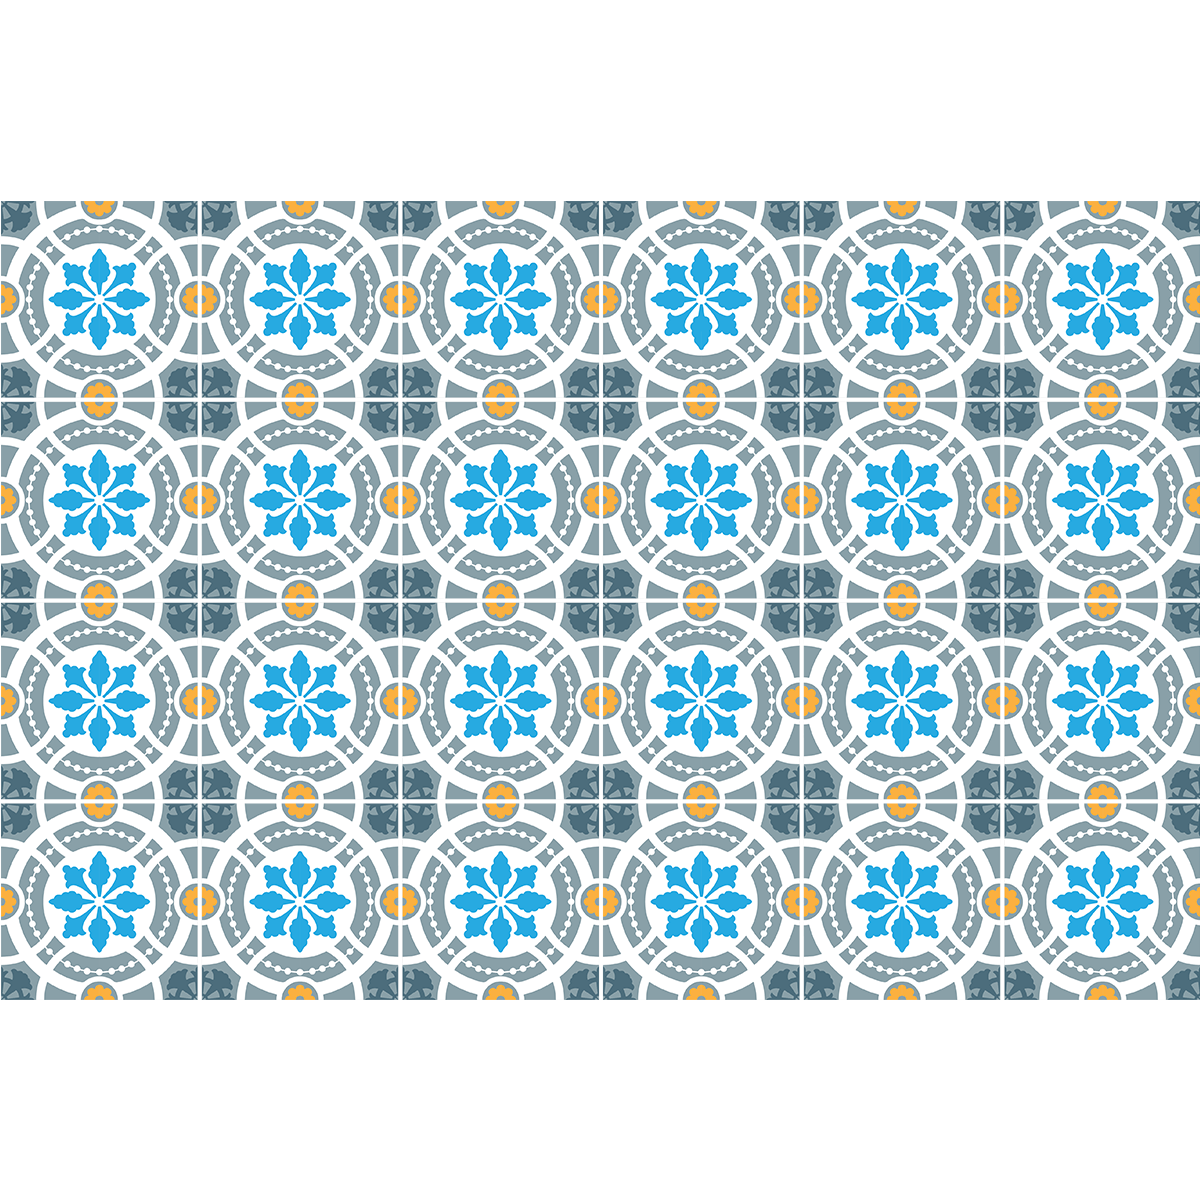 24 stickers carreaux de ciment azulejos arruda cuisine. Black Bedroom Furniture Sets. Home Design Ideas